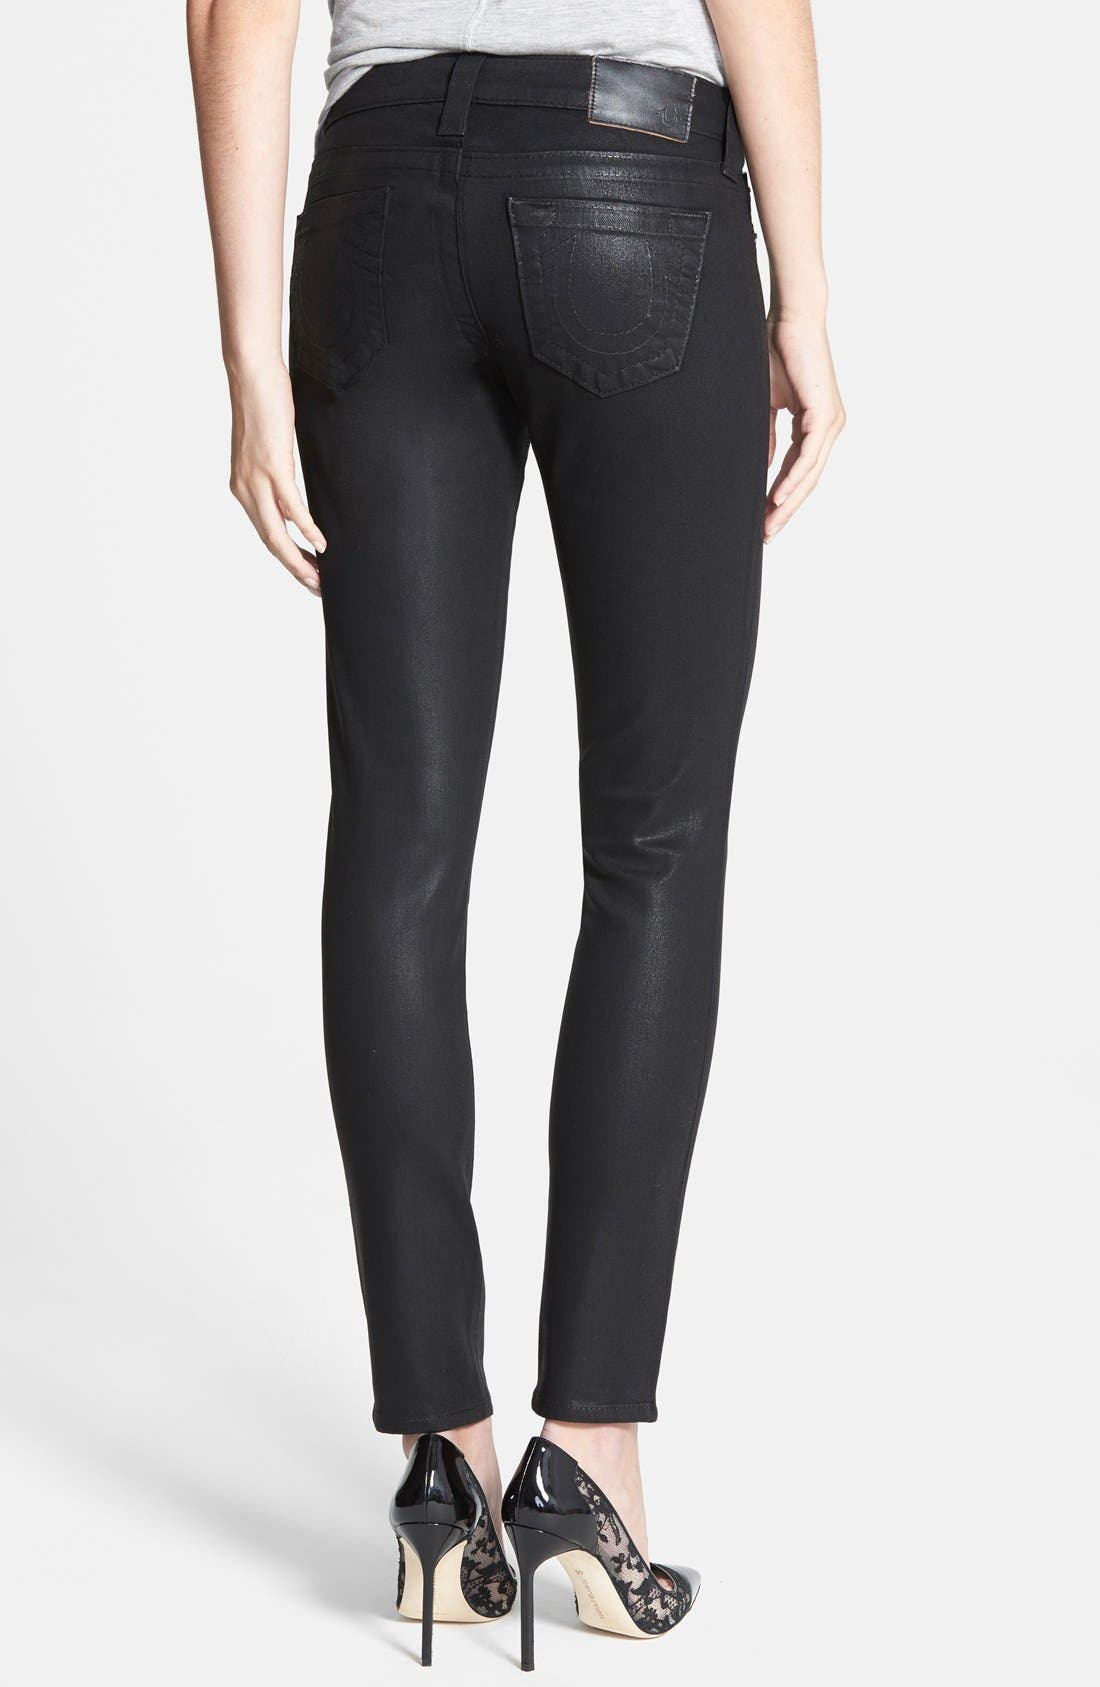 Alternate Image 2  - True Religion Brand Jeans 'Halle - Super Vixen' Coated Skinny Jeans (Black)